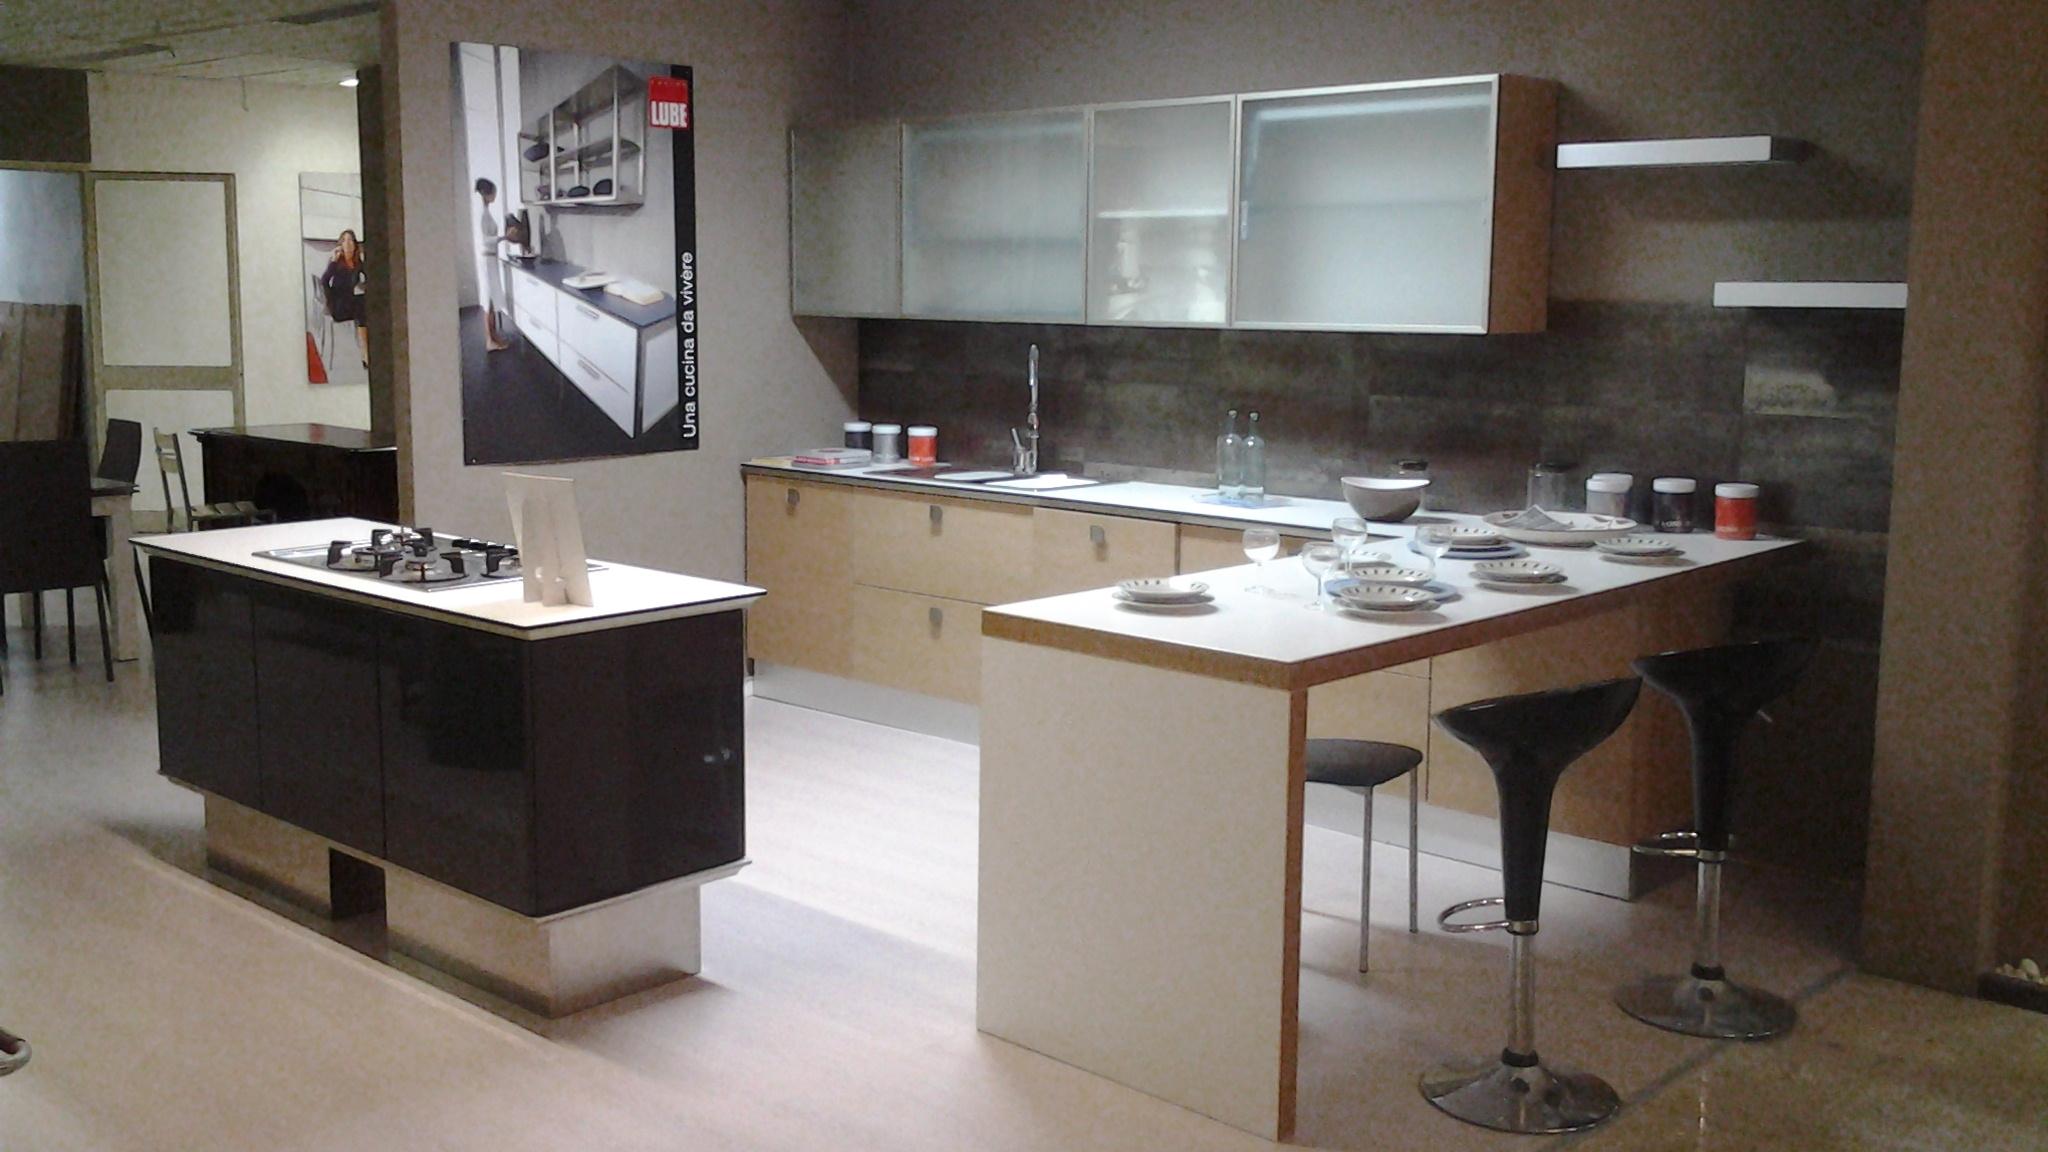 Cucine Moderne Con Isola Centrale. Cucine Moderne Con Isola Centrale ...